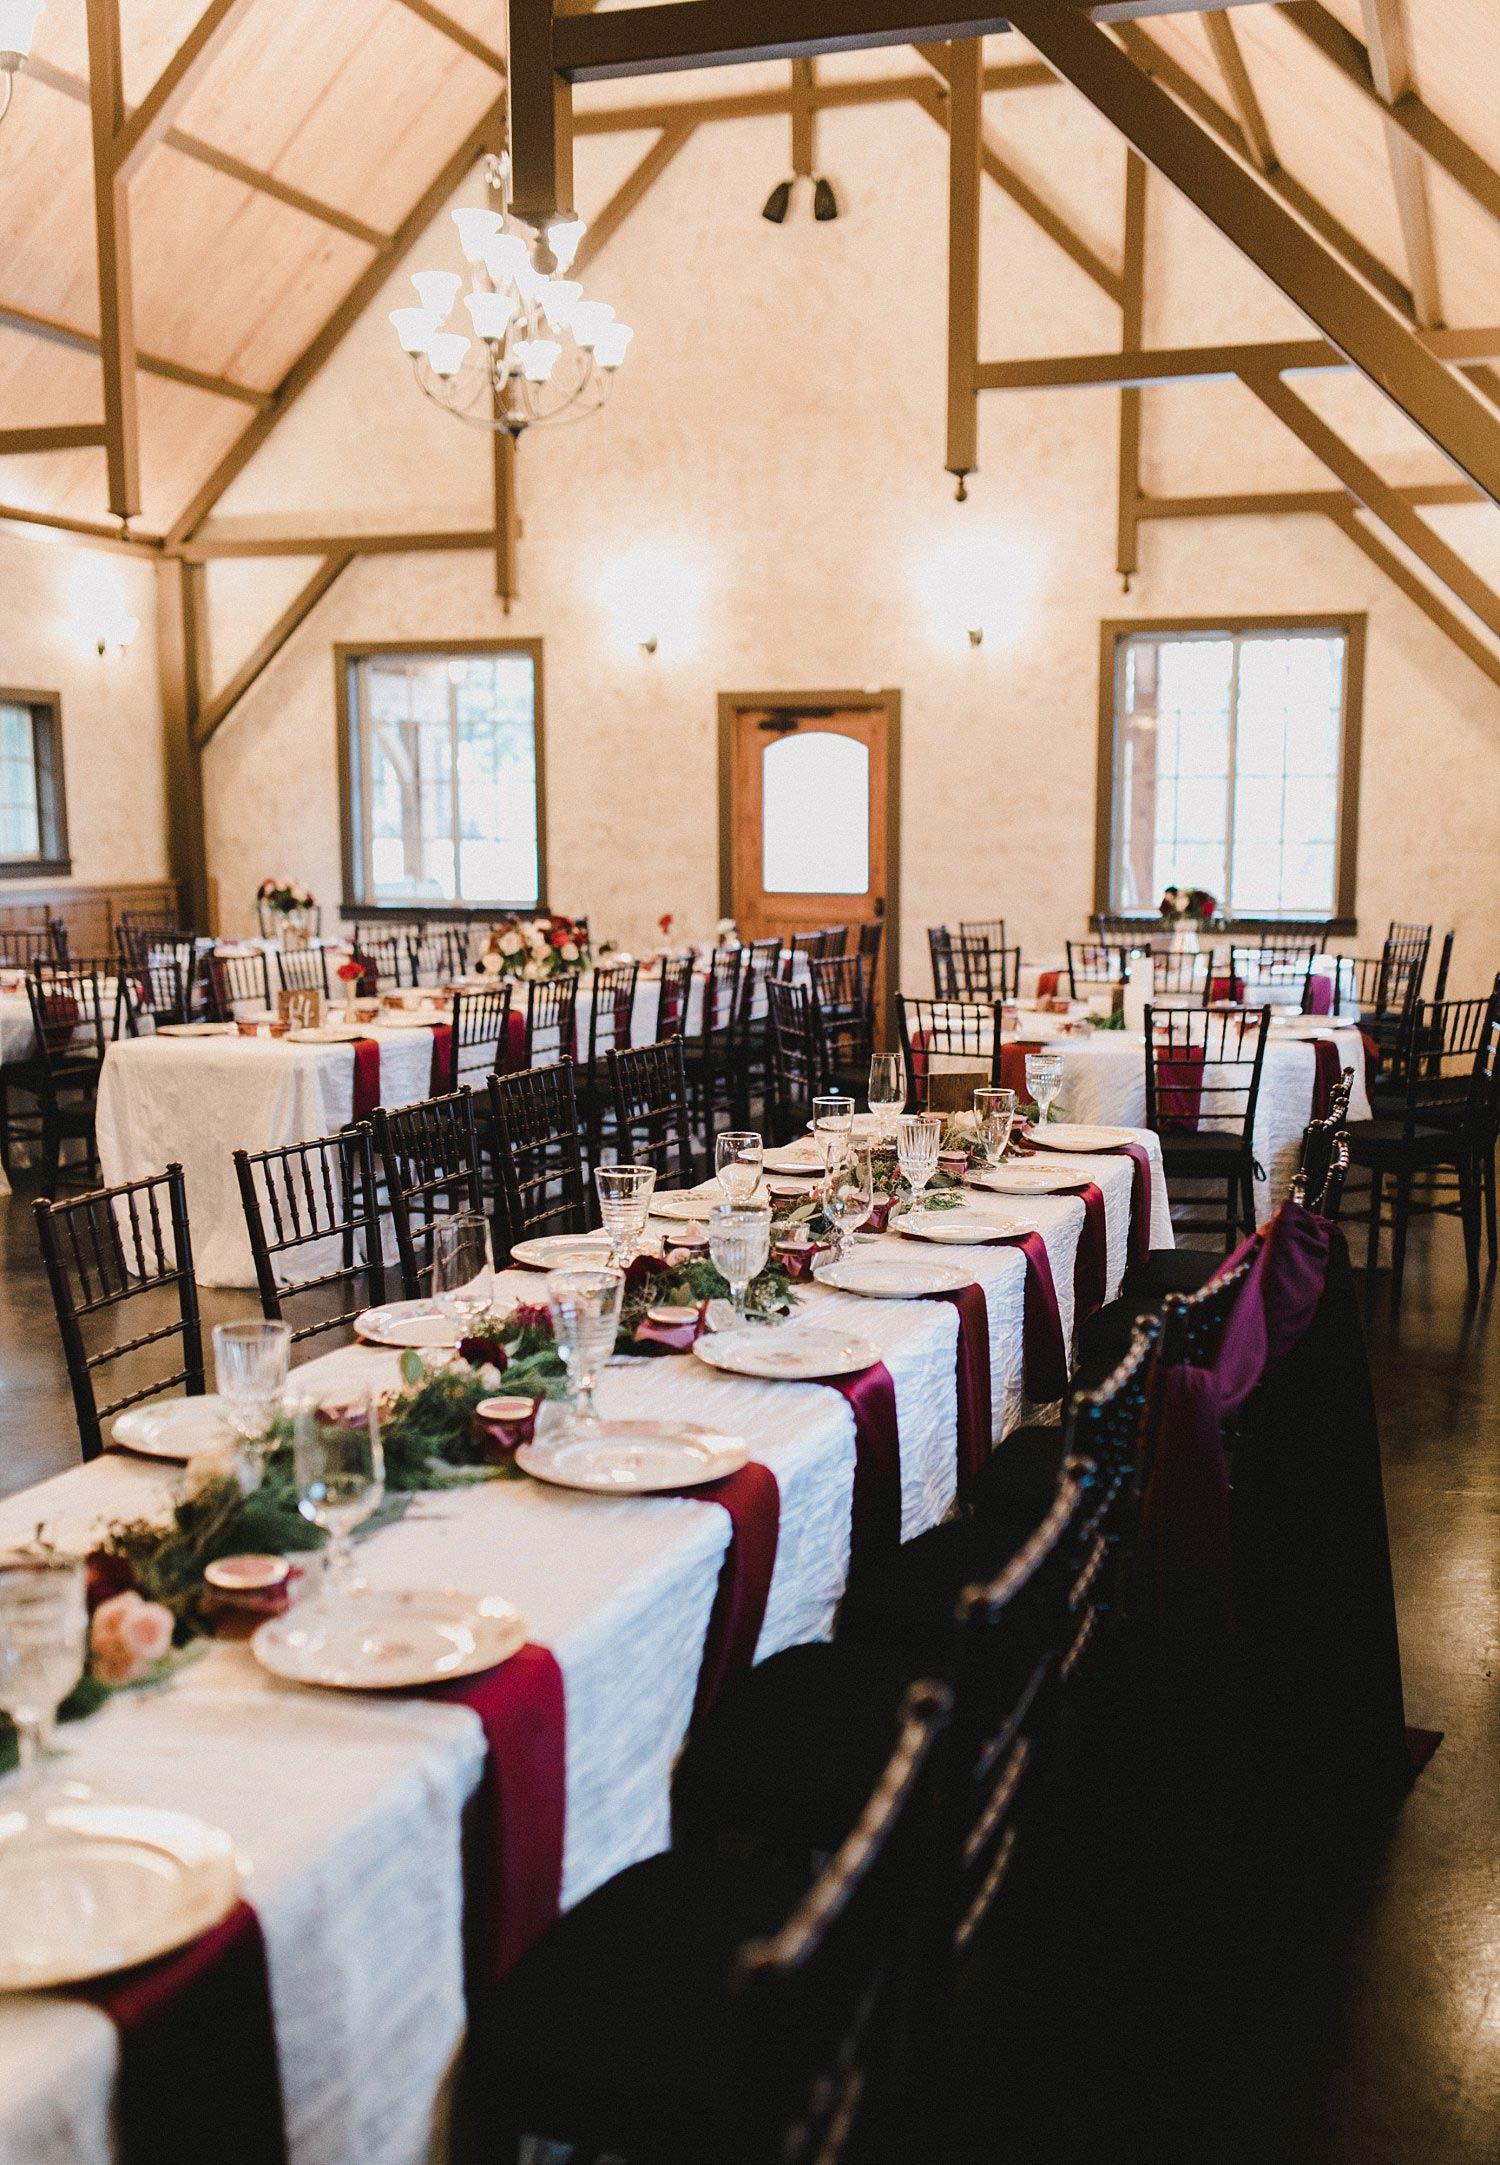 Hollow Hill Farm Event Center Wedding great room reception head table